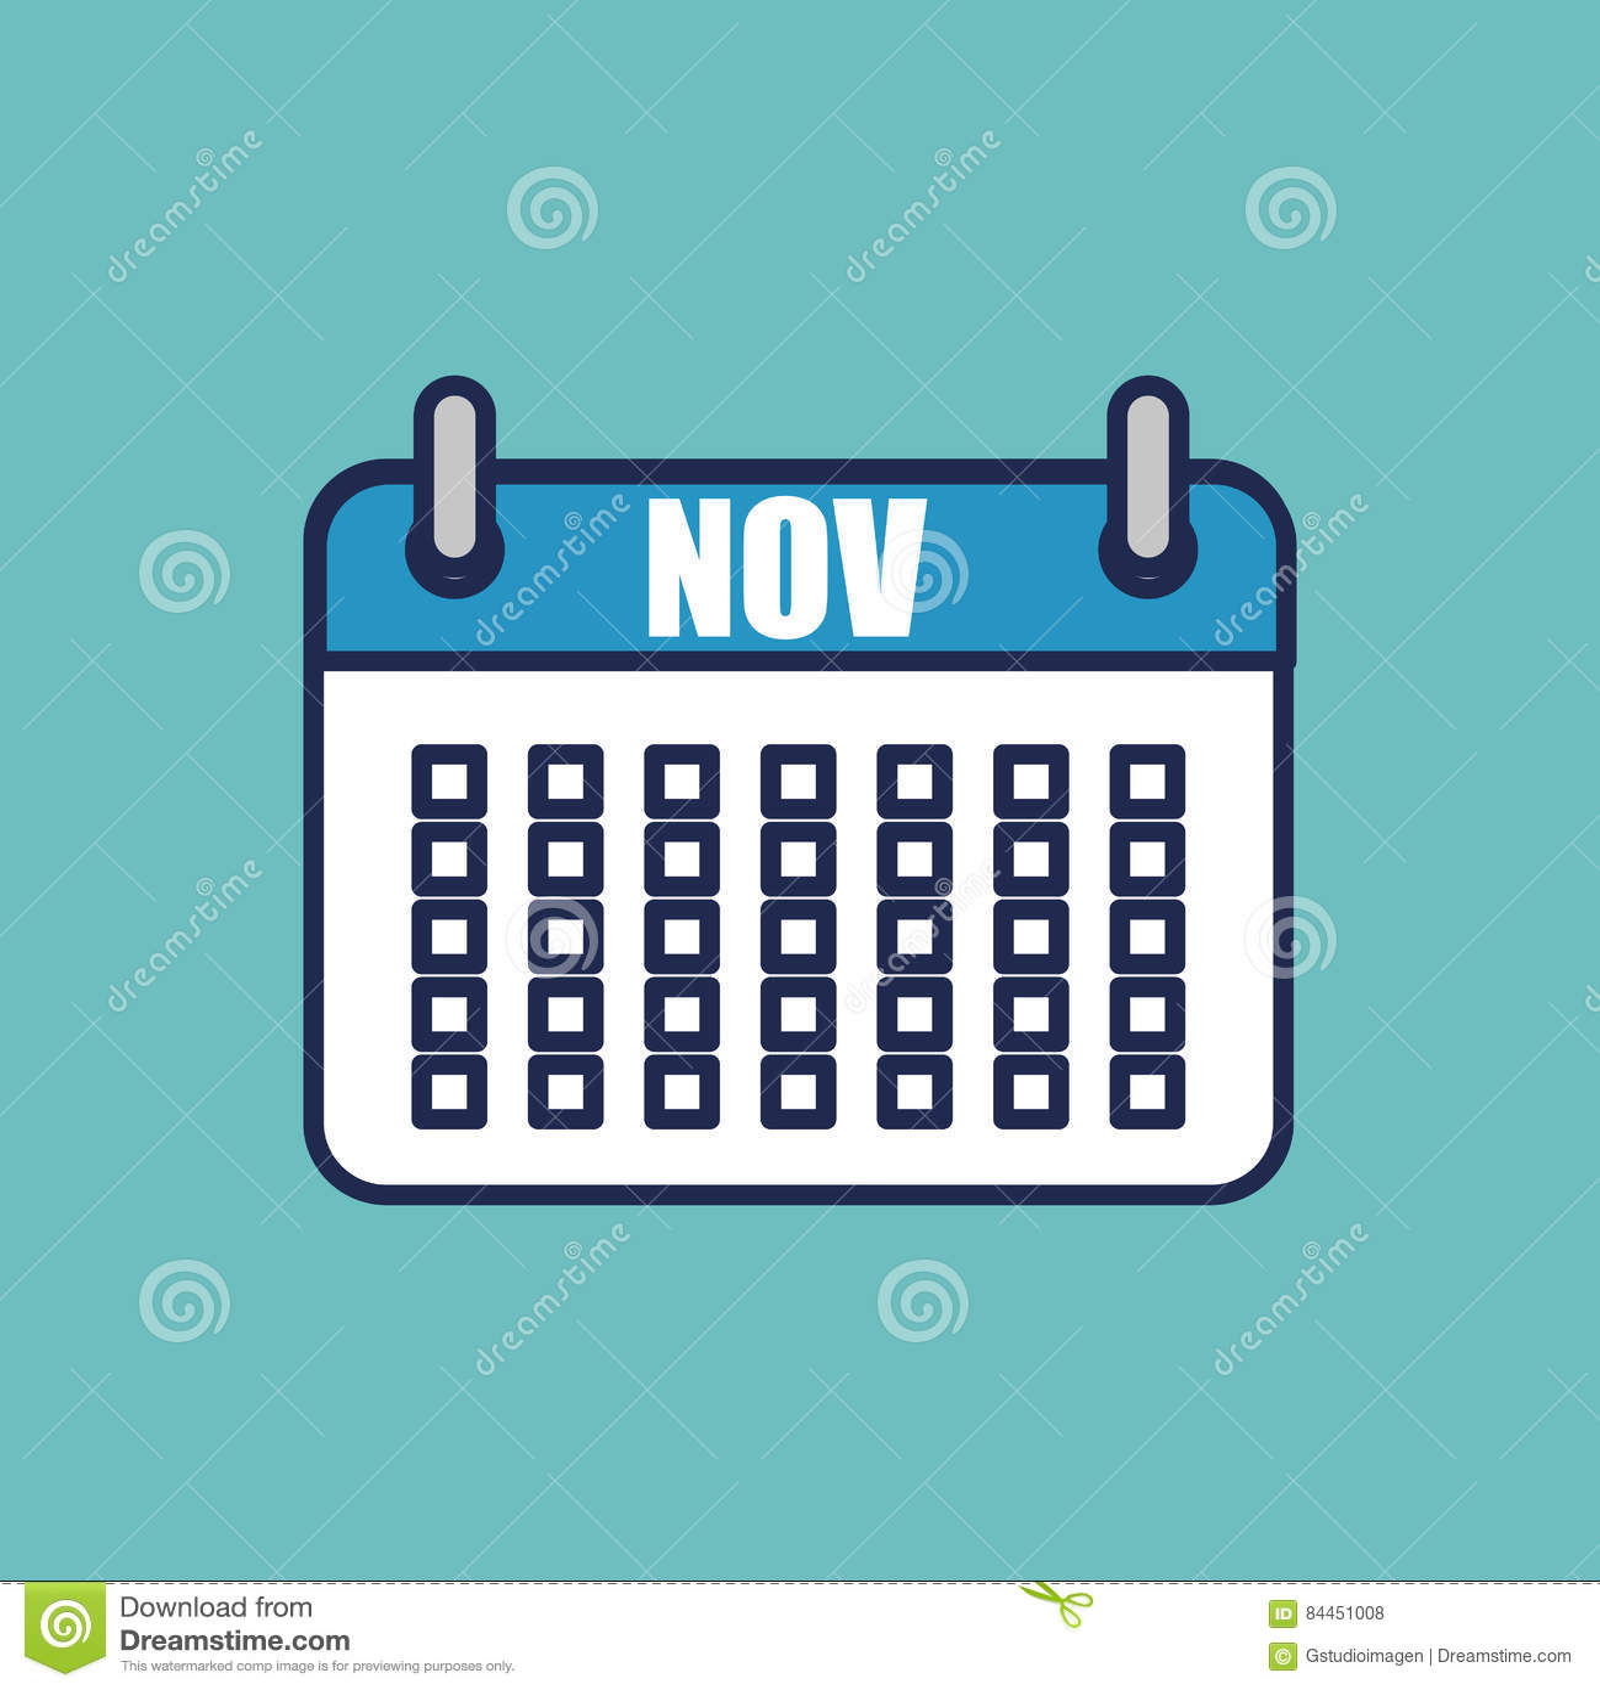 Calendar Reminder Design : Calendar reminder isolated icon cartoon vector